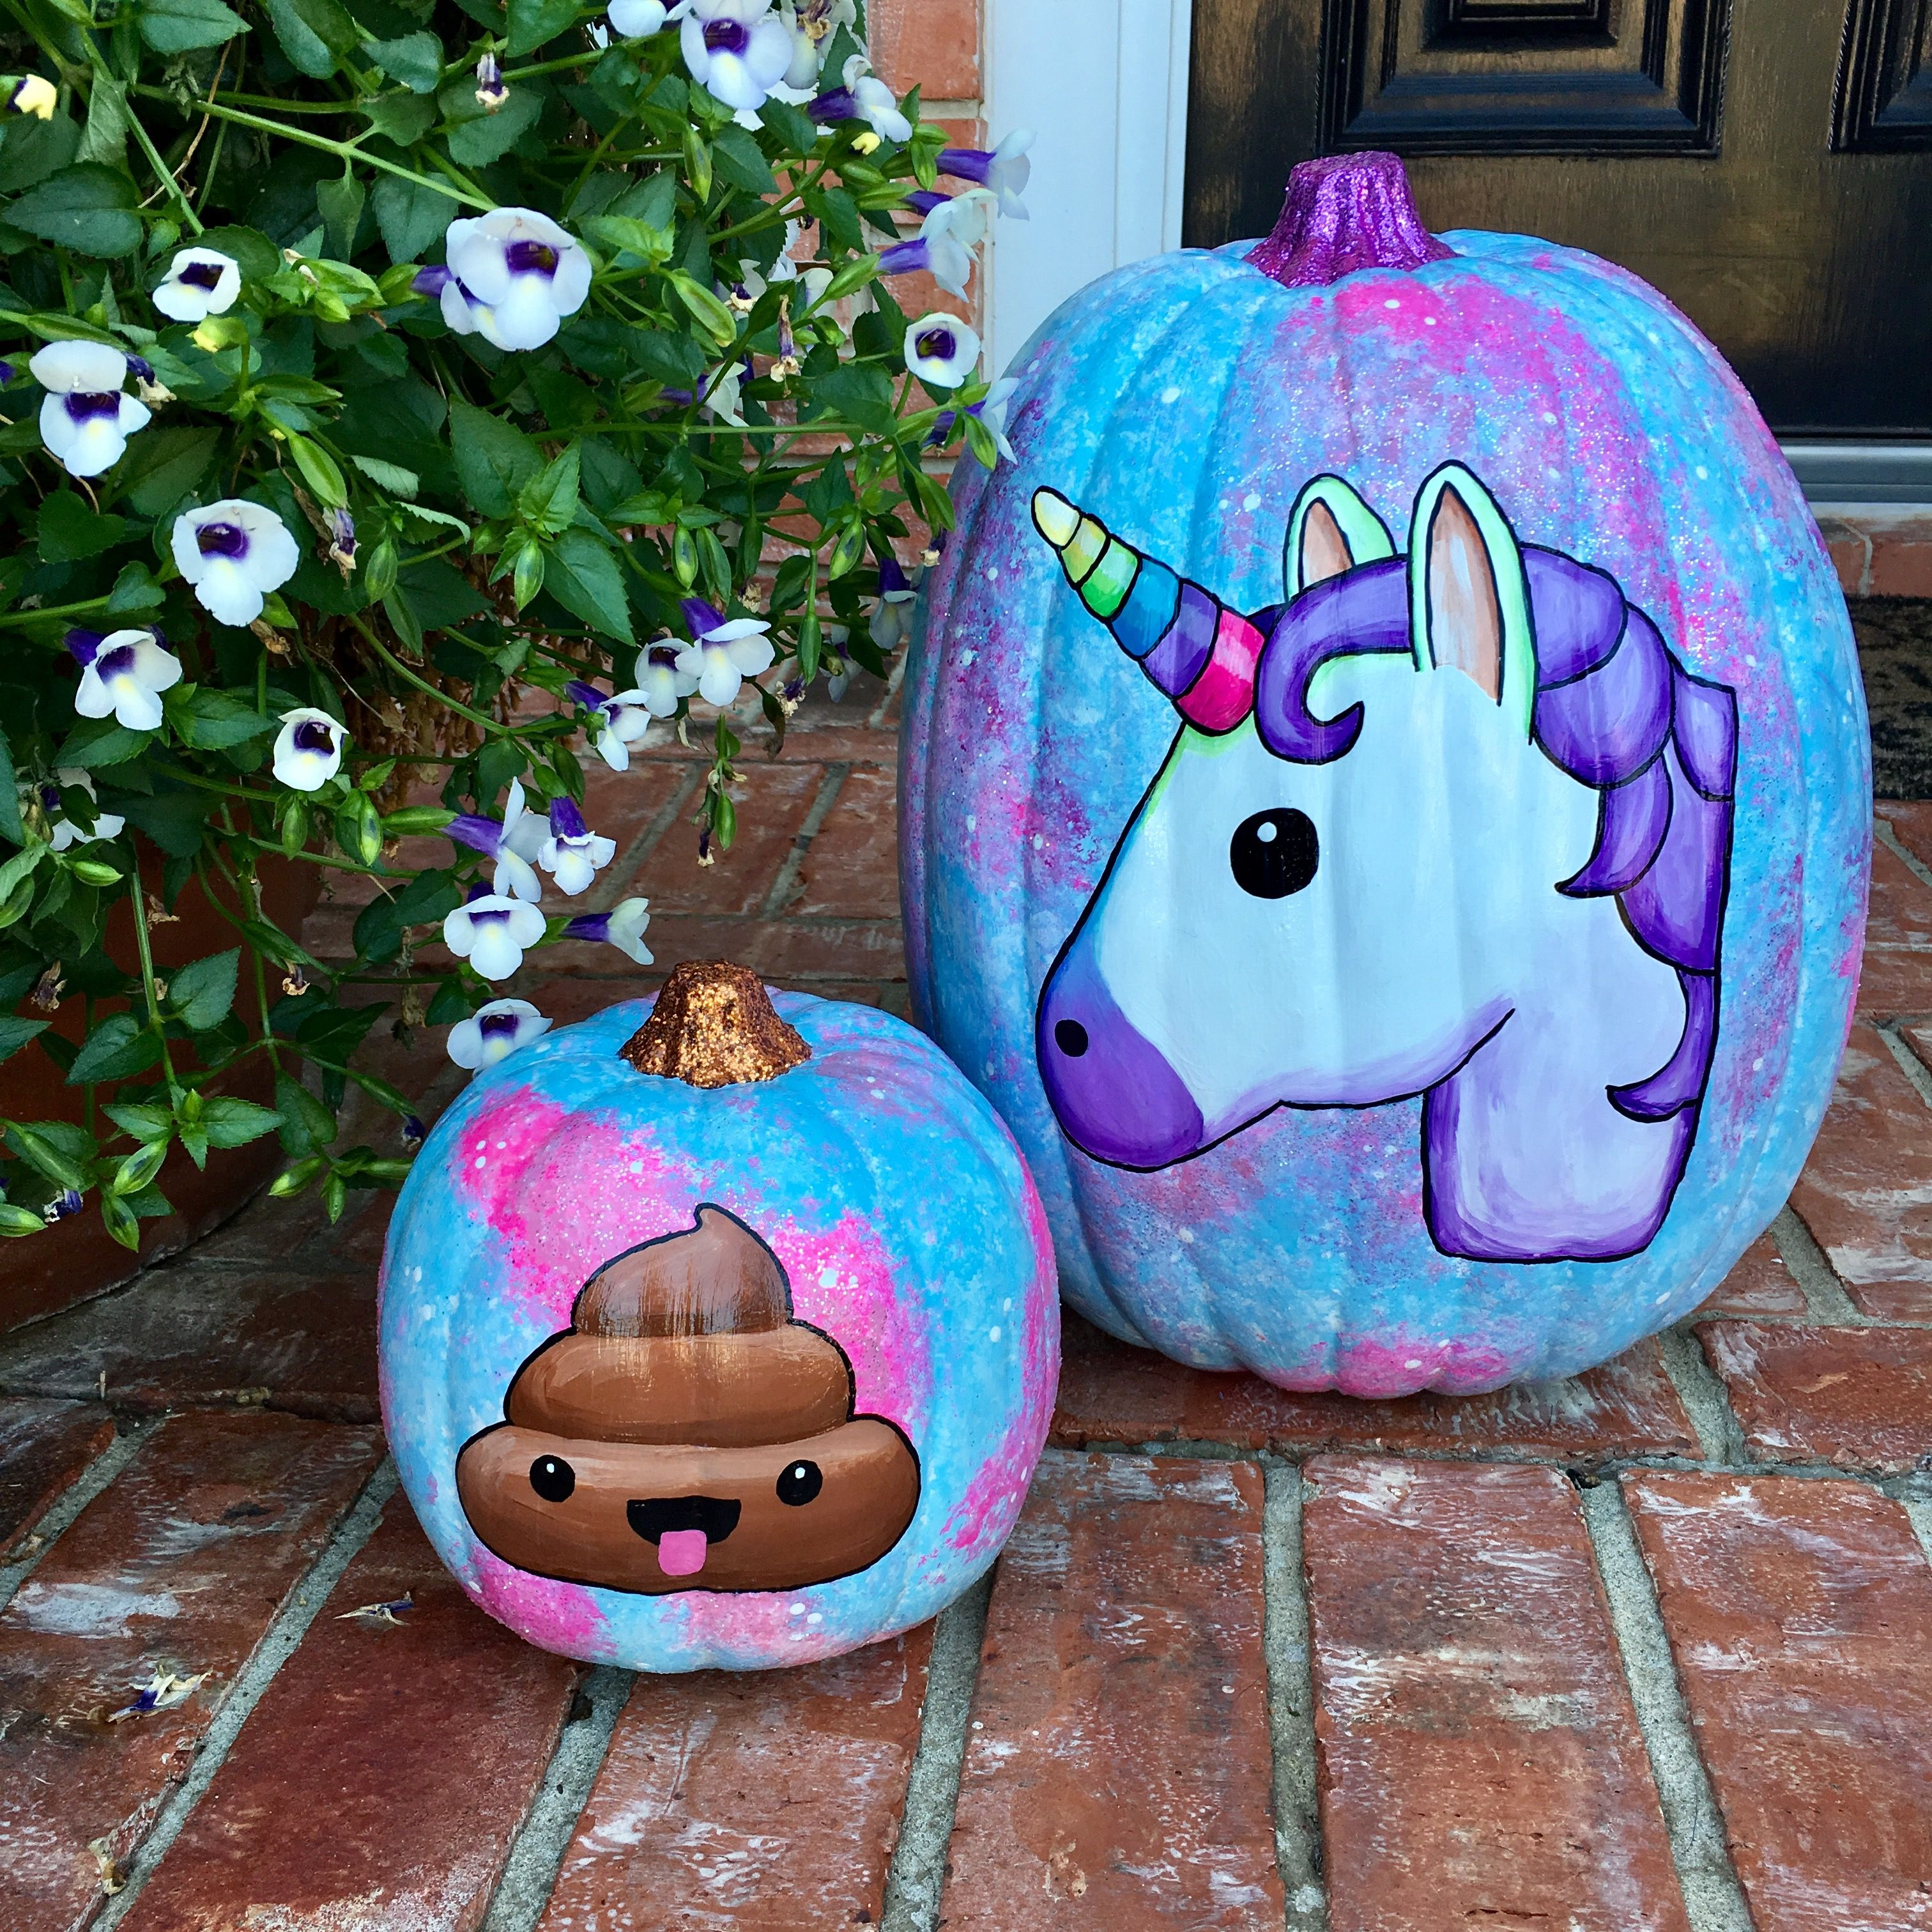 Galaxy unicorn and poop emoji pumpkins!